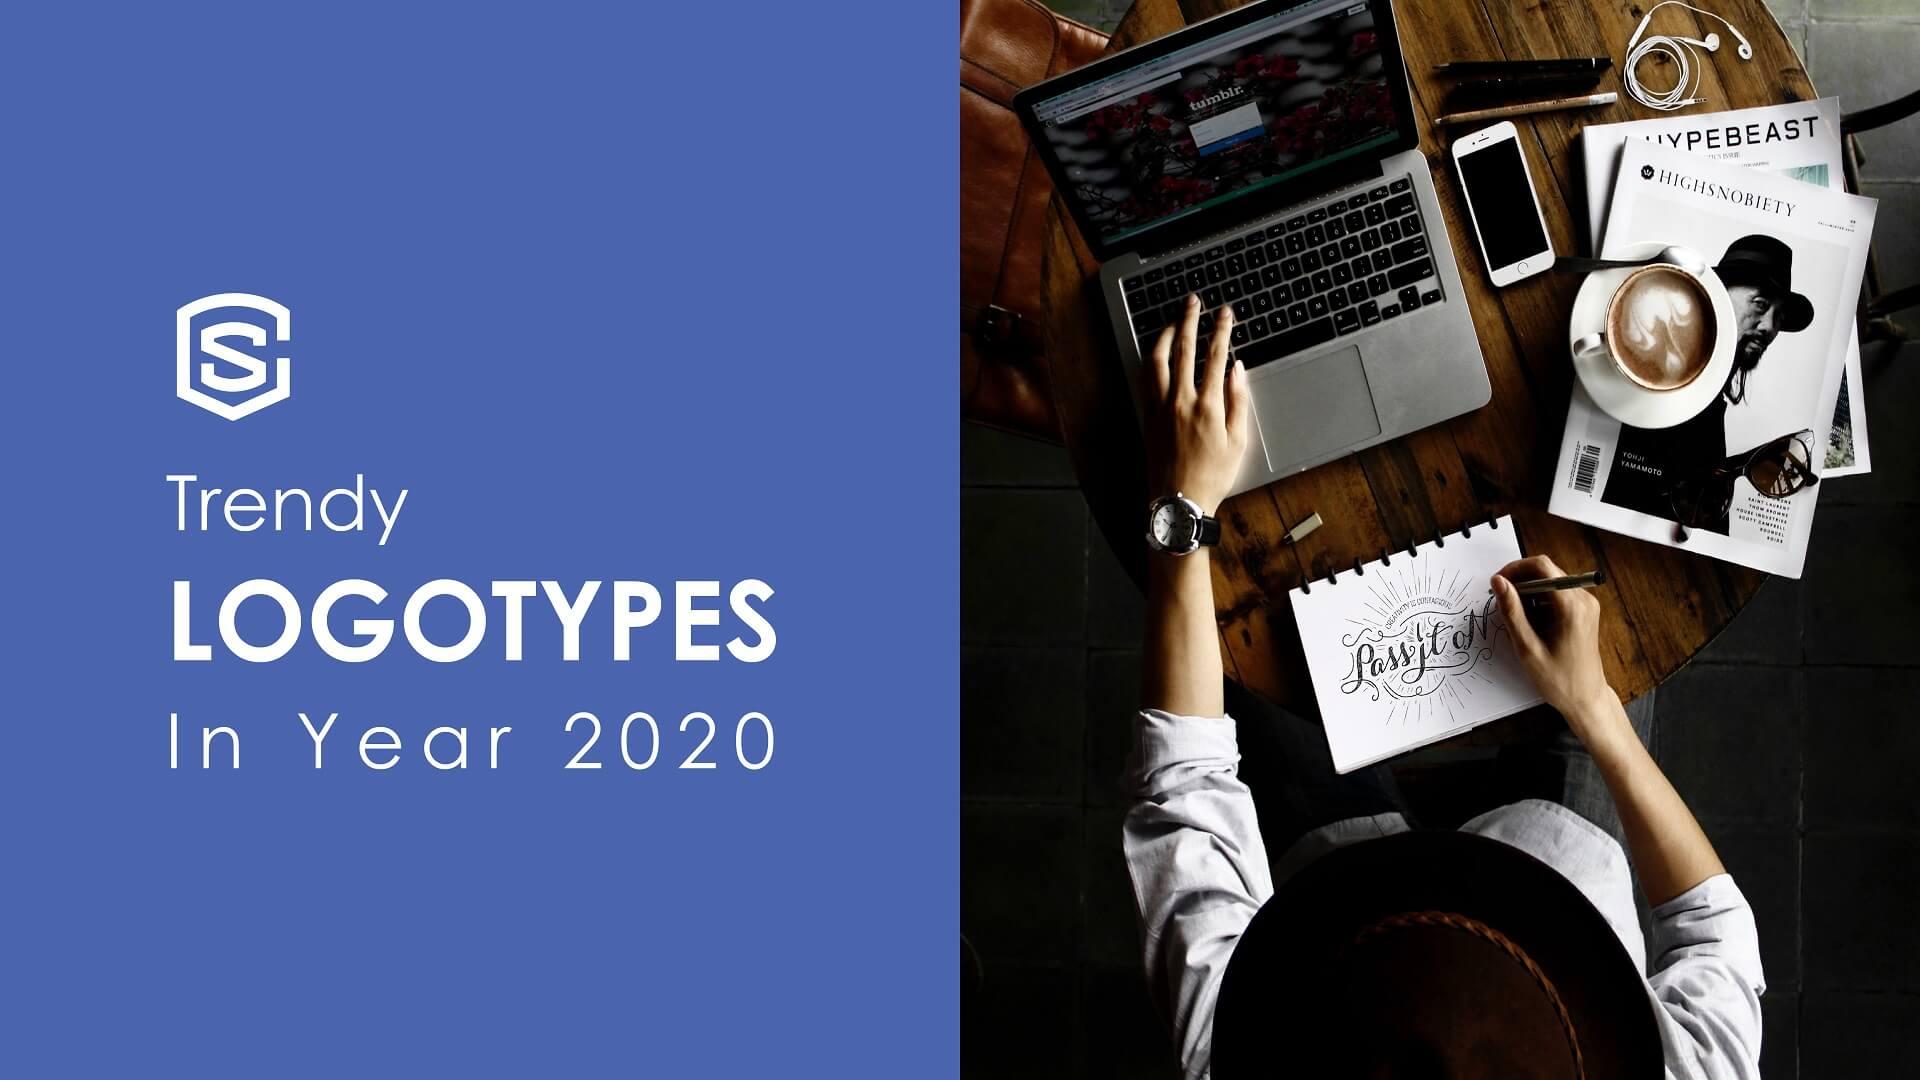 LOGOTYPE, Trendy LOGOTYPES In Year 2020